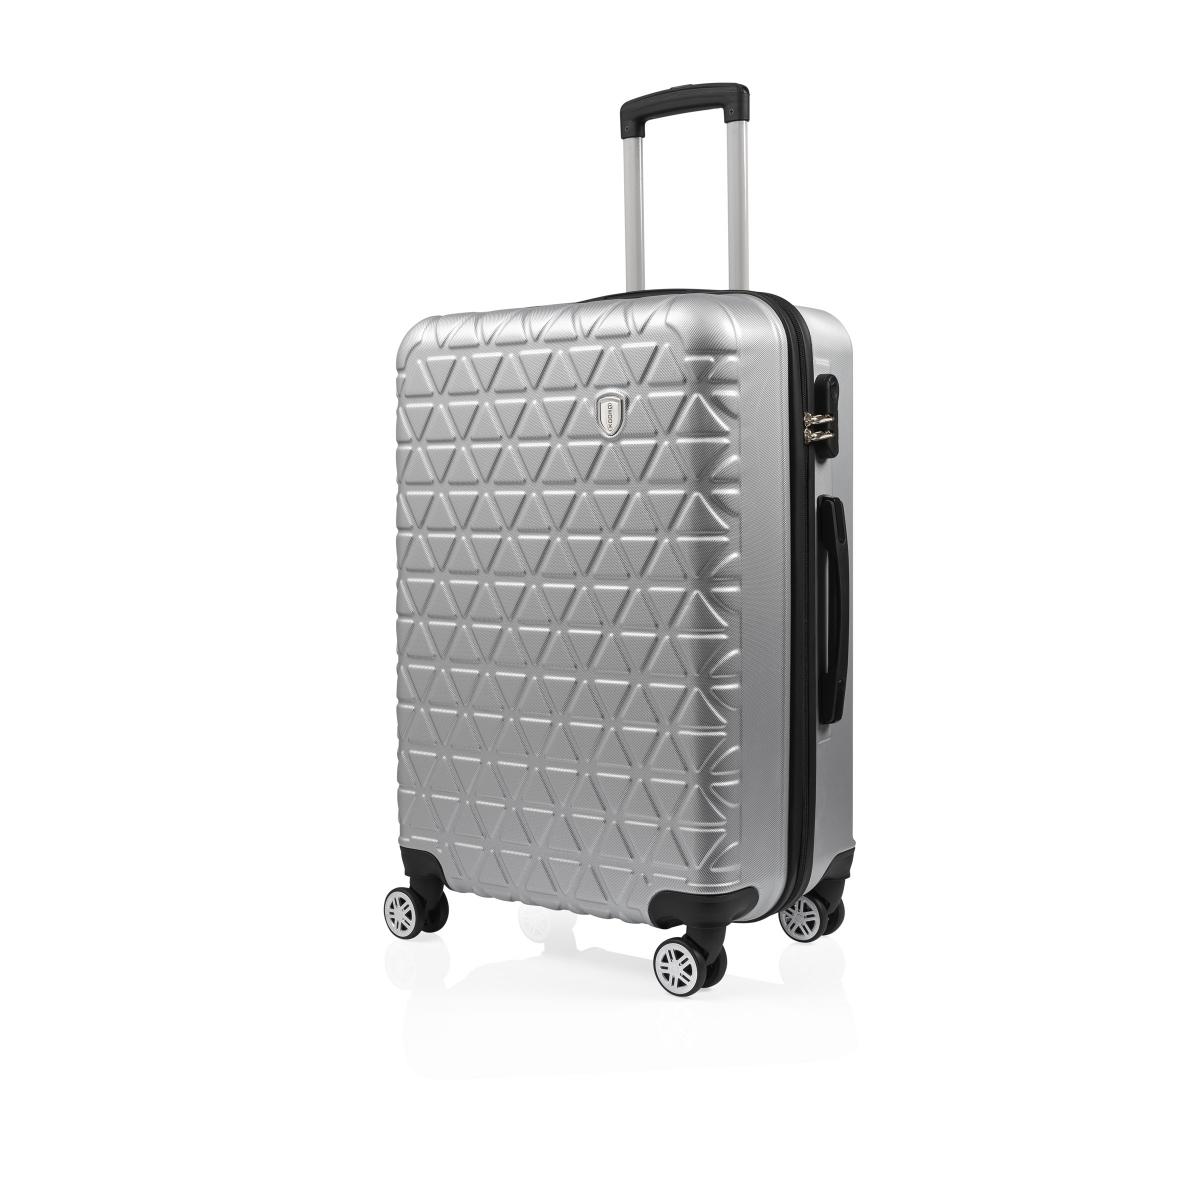 Gedox Abs 3'lü Valiz Seyahat Seti - Model:800.03 Gri